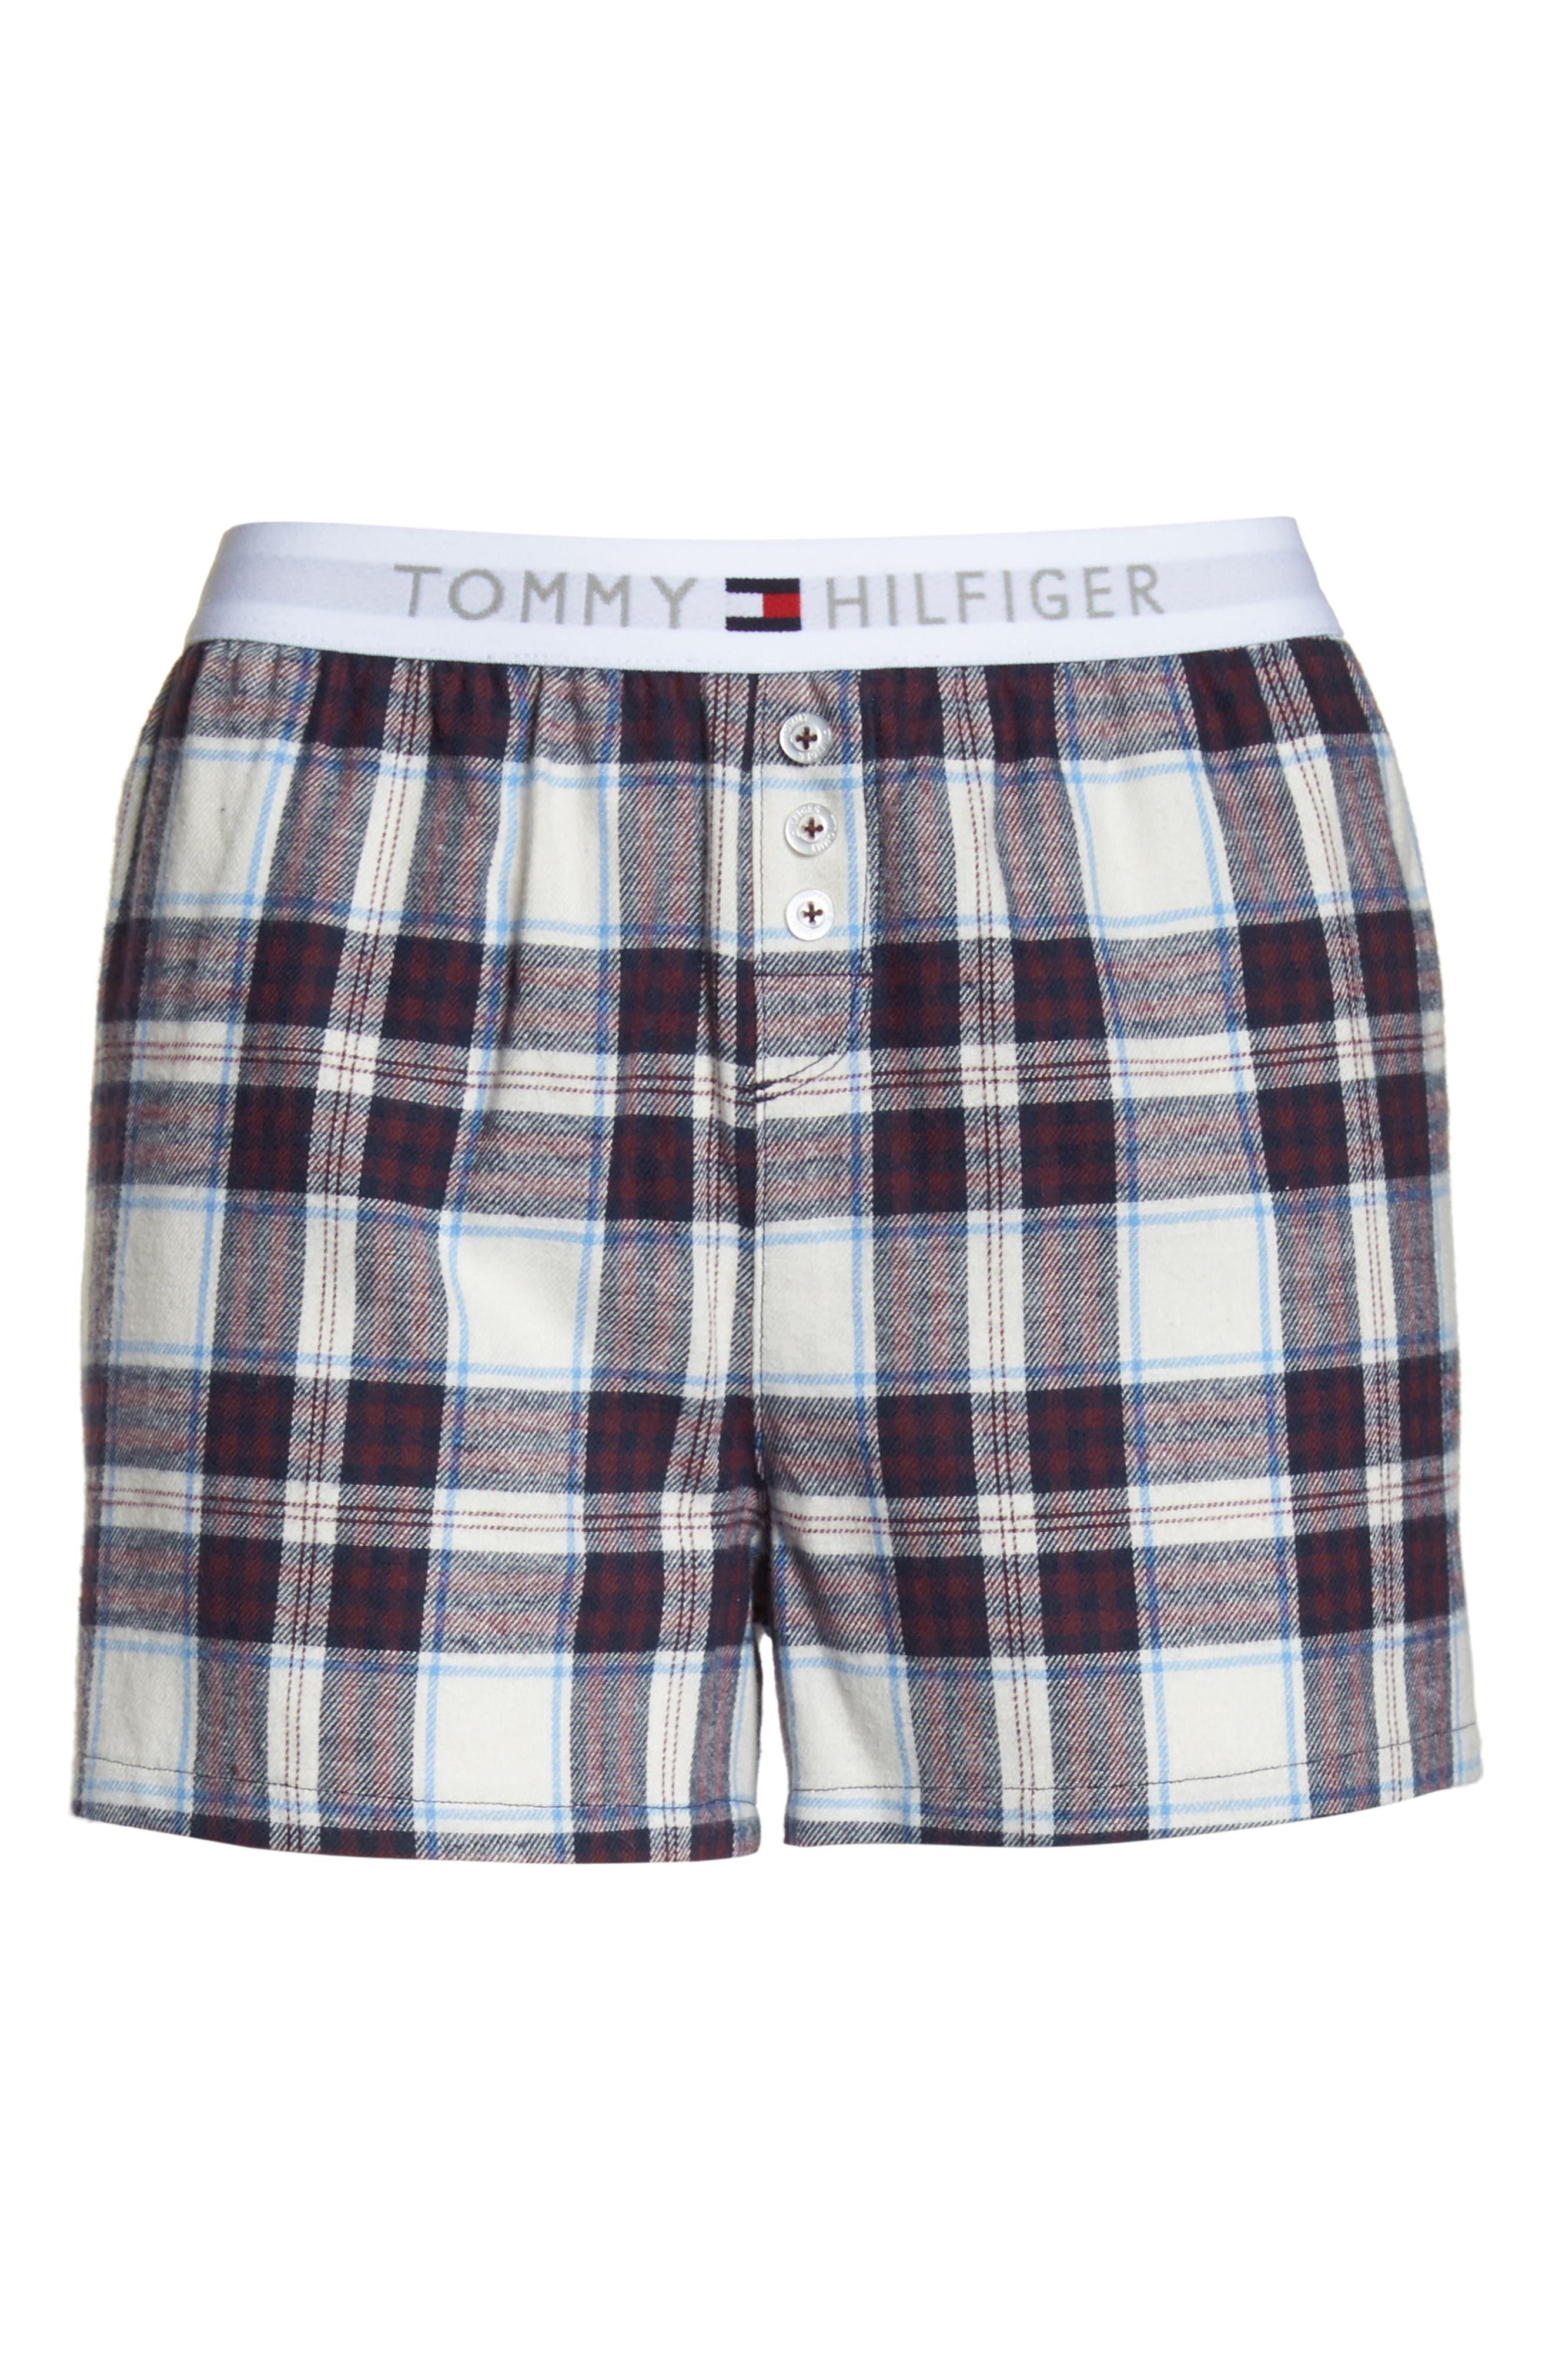 Plaid Pajama Shorts,                             Alternate thumbnail 6, color,                             SWEET DREAMS FIG TARTAN